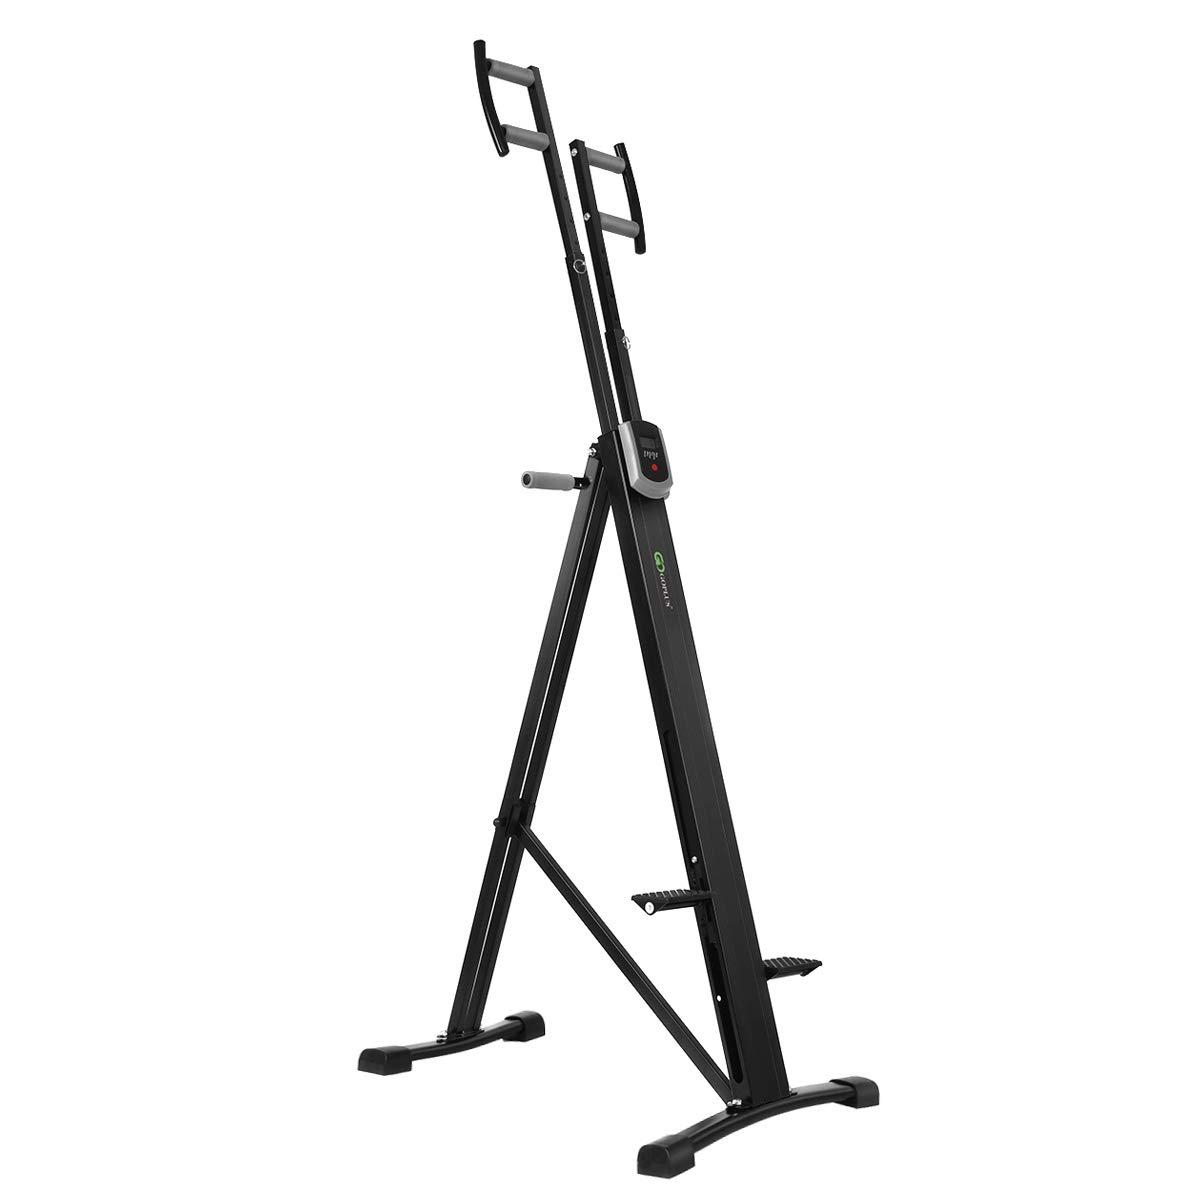 Goplus Vertical Climber Exercise Climbing Machine Folding Step Climber Exercise Equipment by Goplus (Image #7)